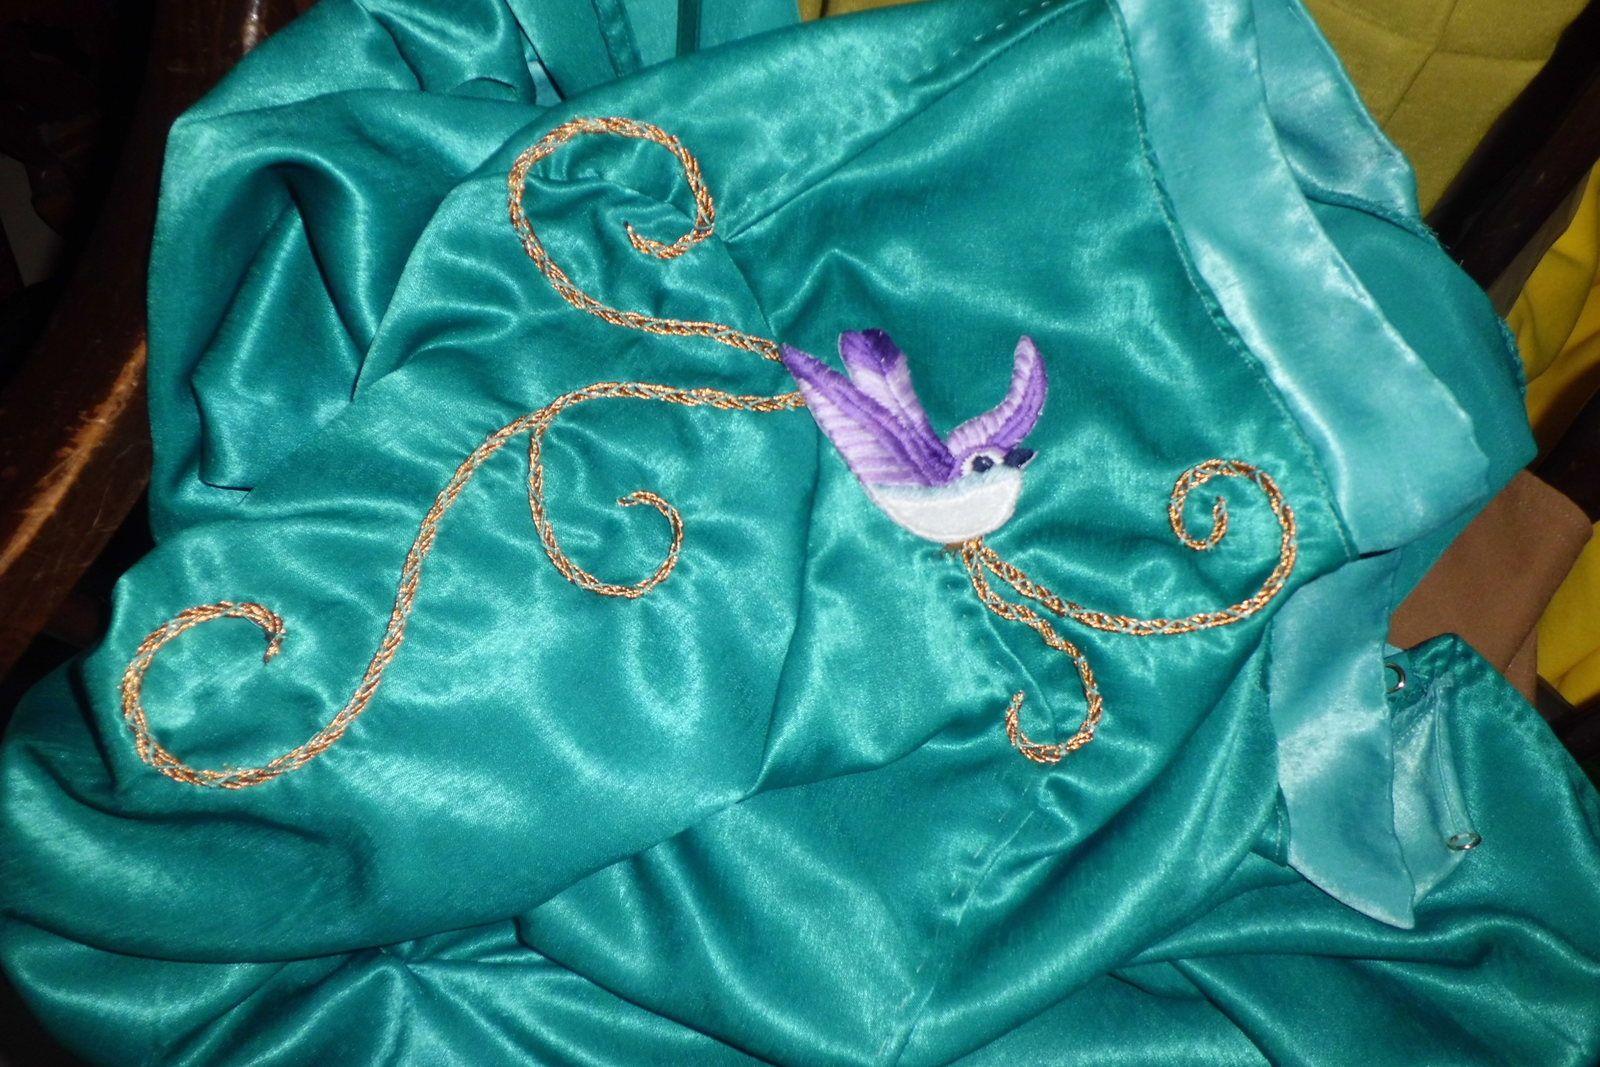 Projet Cersei: La Broderie/ Cersei Project: The embroidery